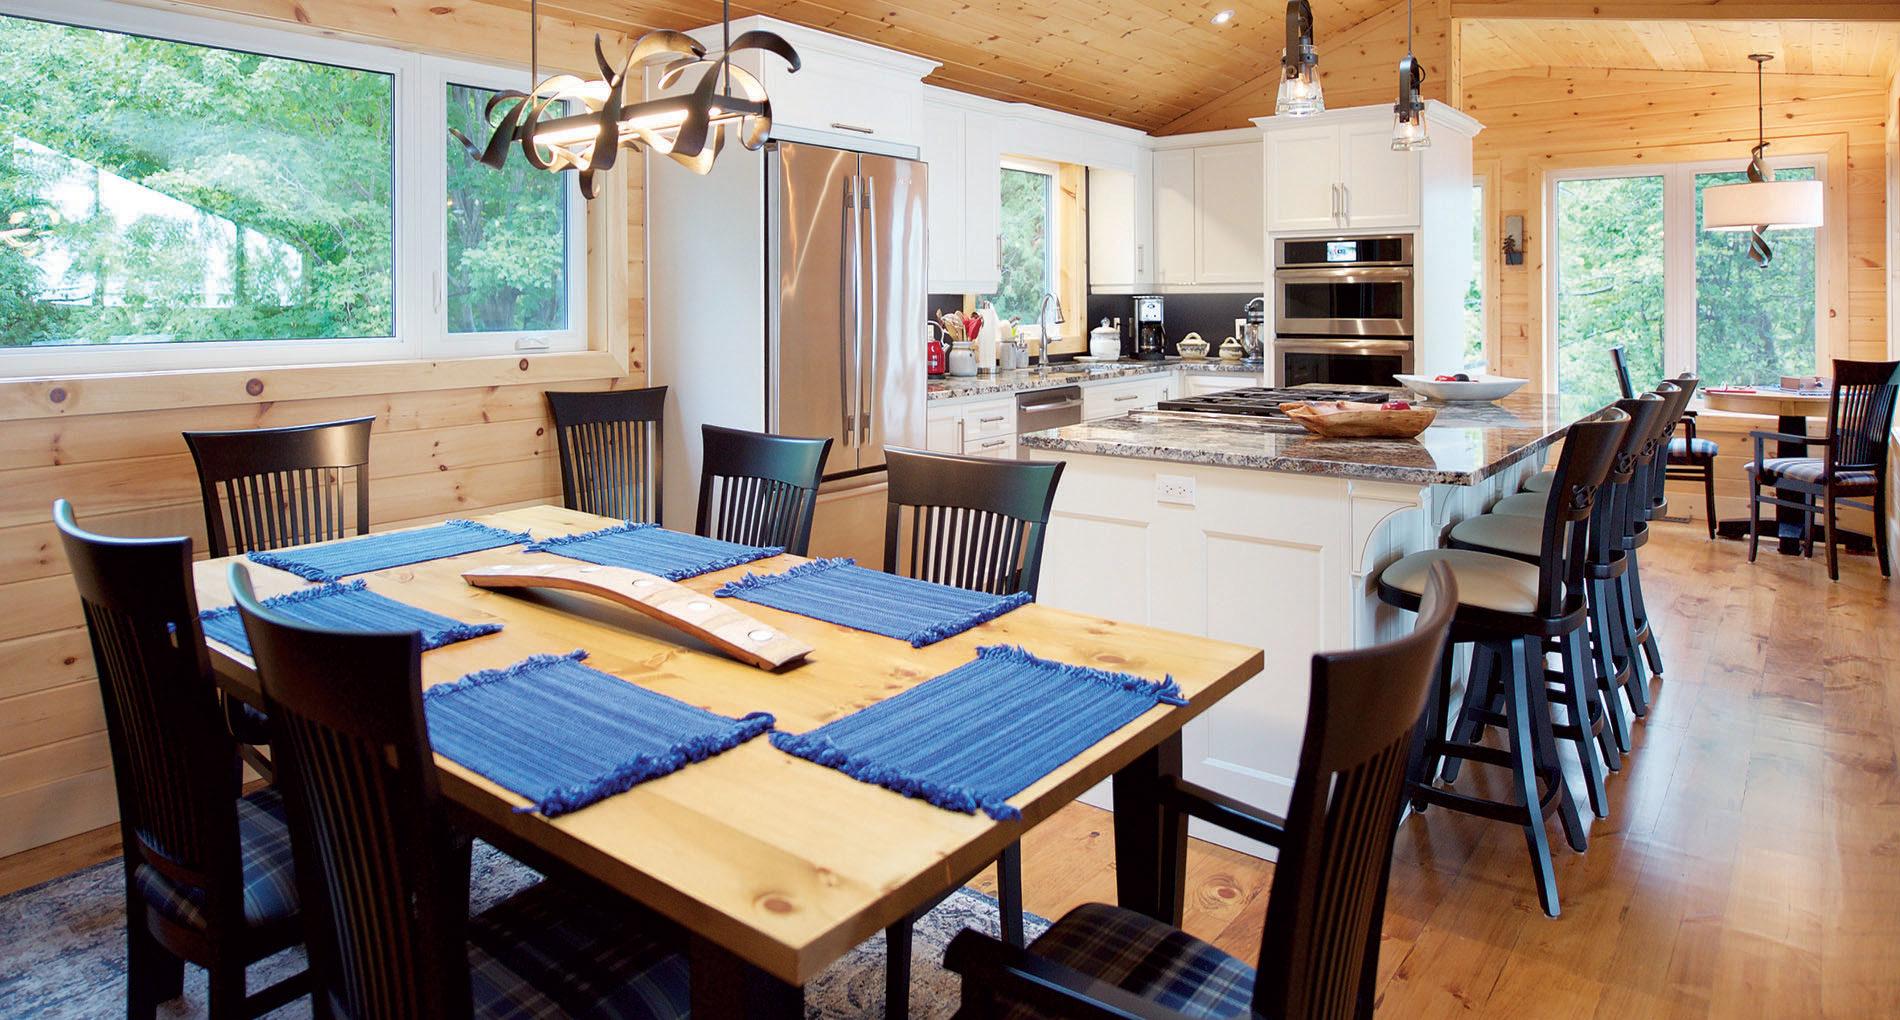 Home Renovation Scarborough Tinybeaches Slider